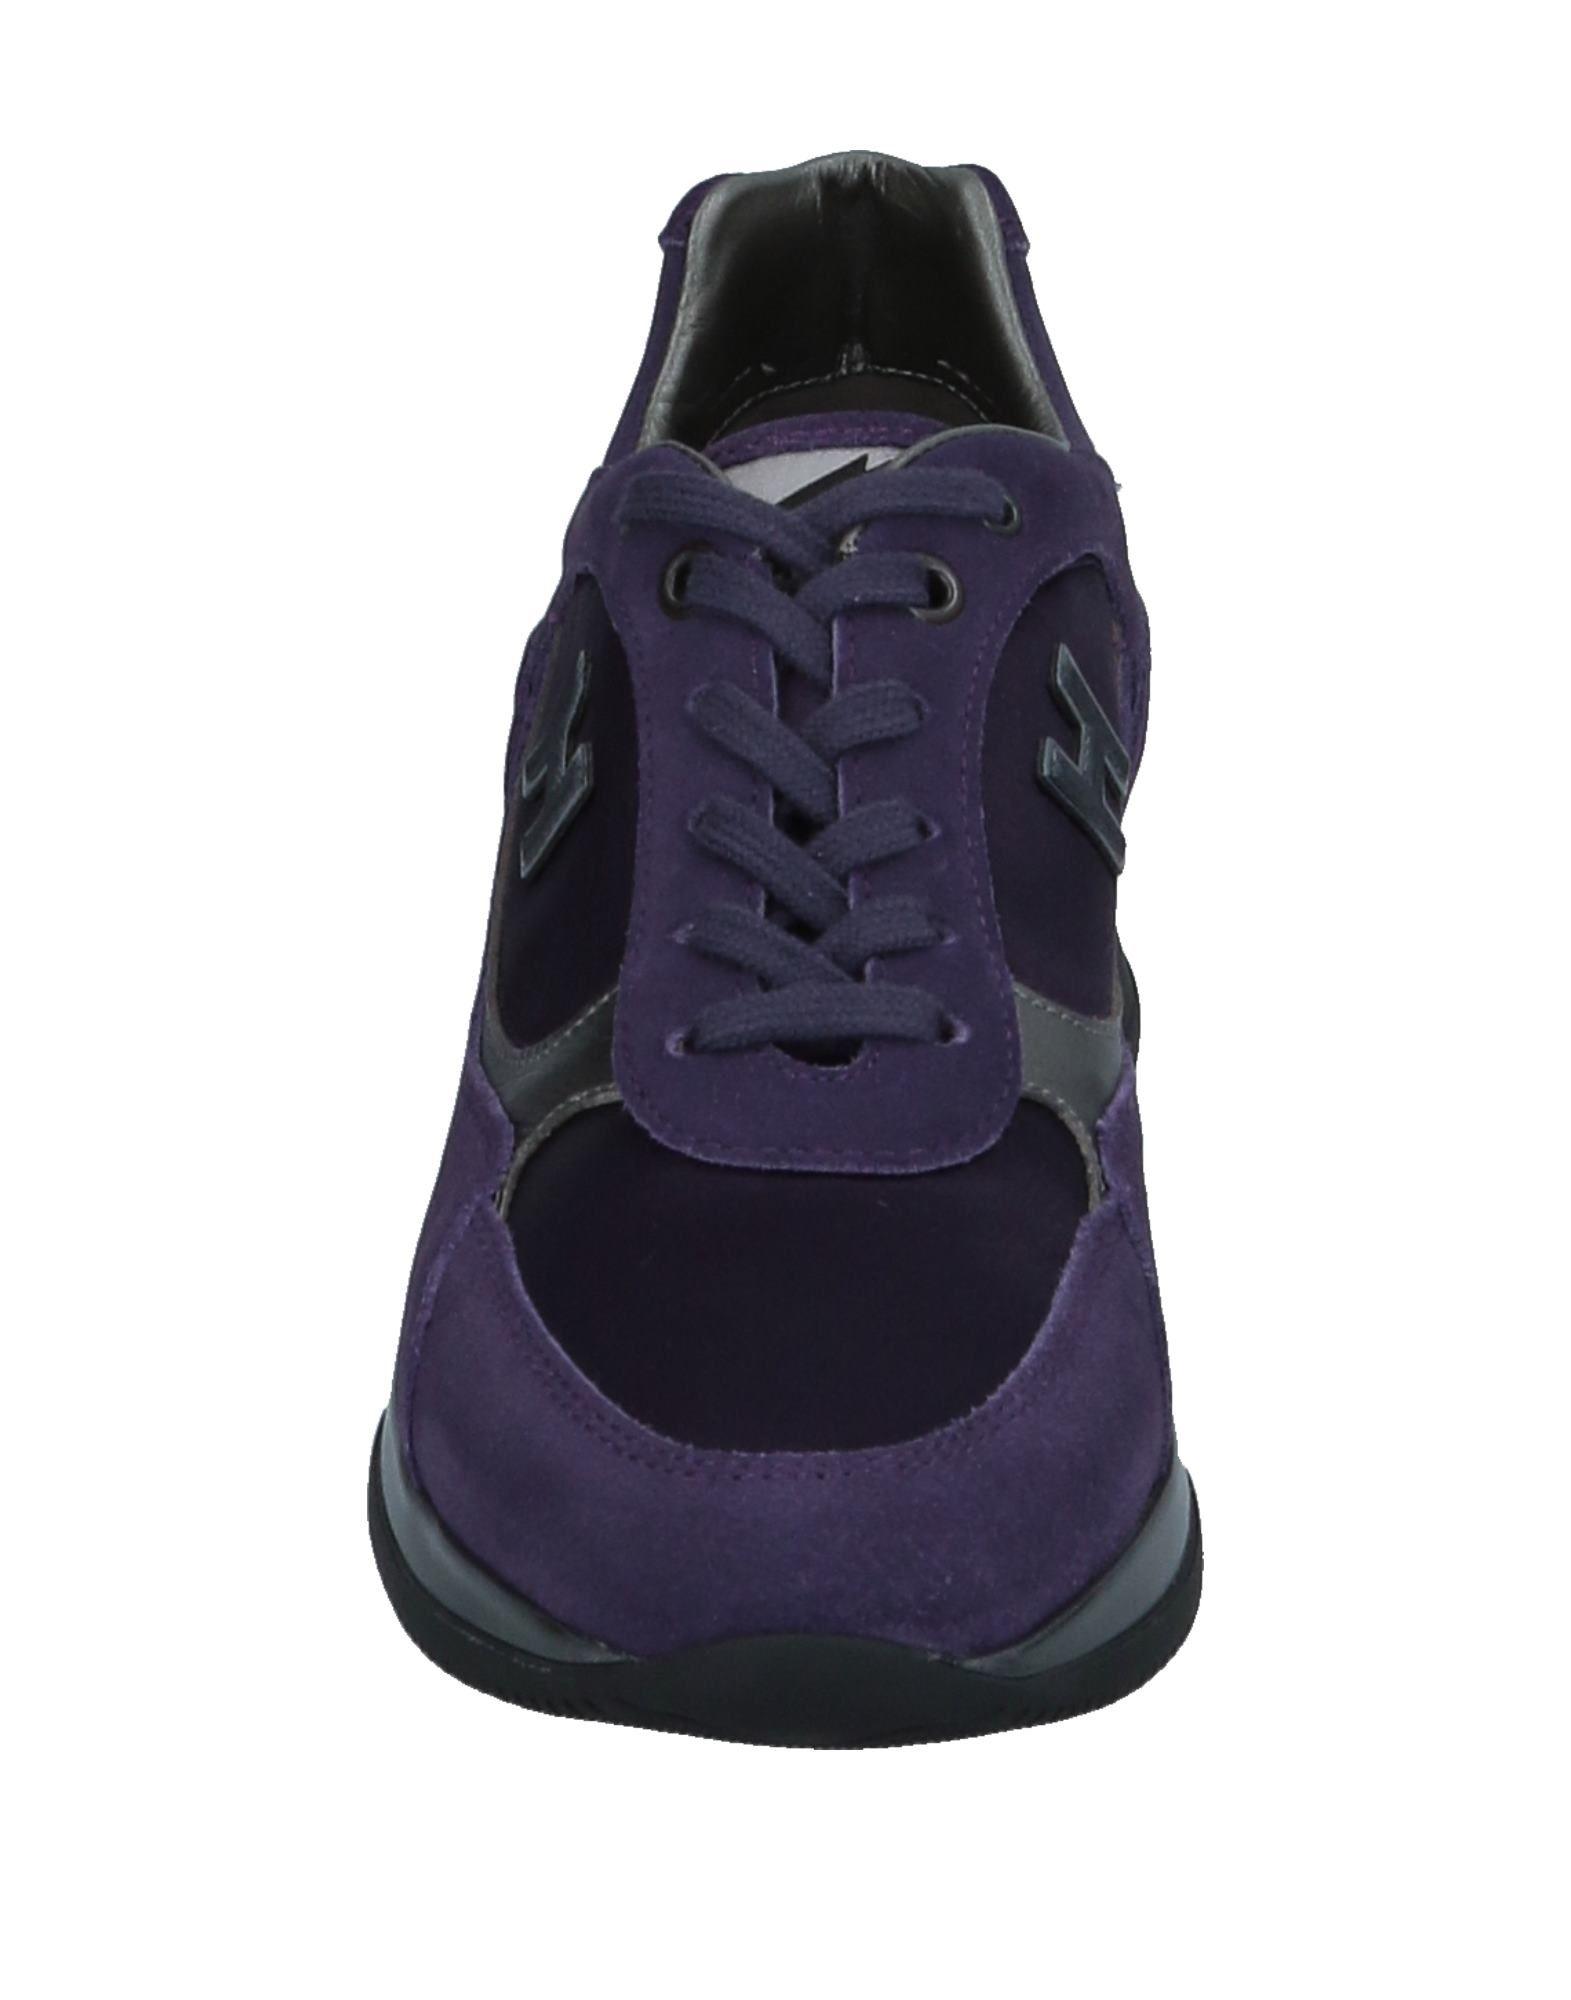 Hogan Sneakers Schuhe Damen  11539879FQ Heiße Schuhe Sneakers 3aab1a